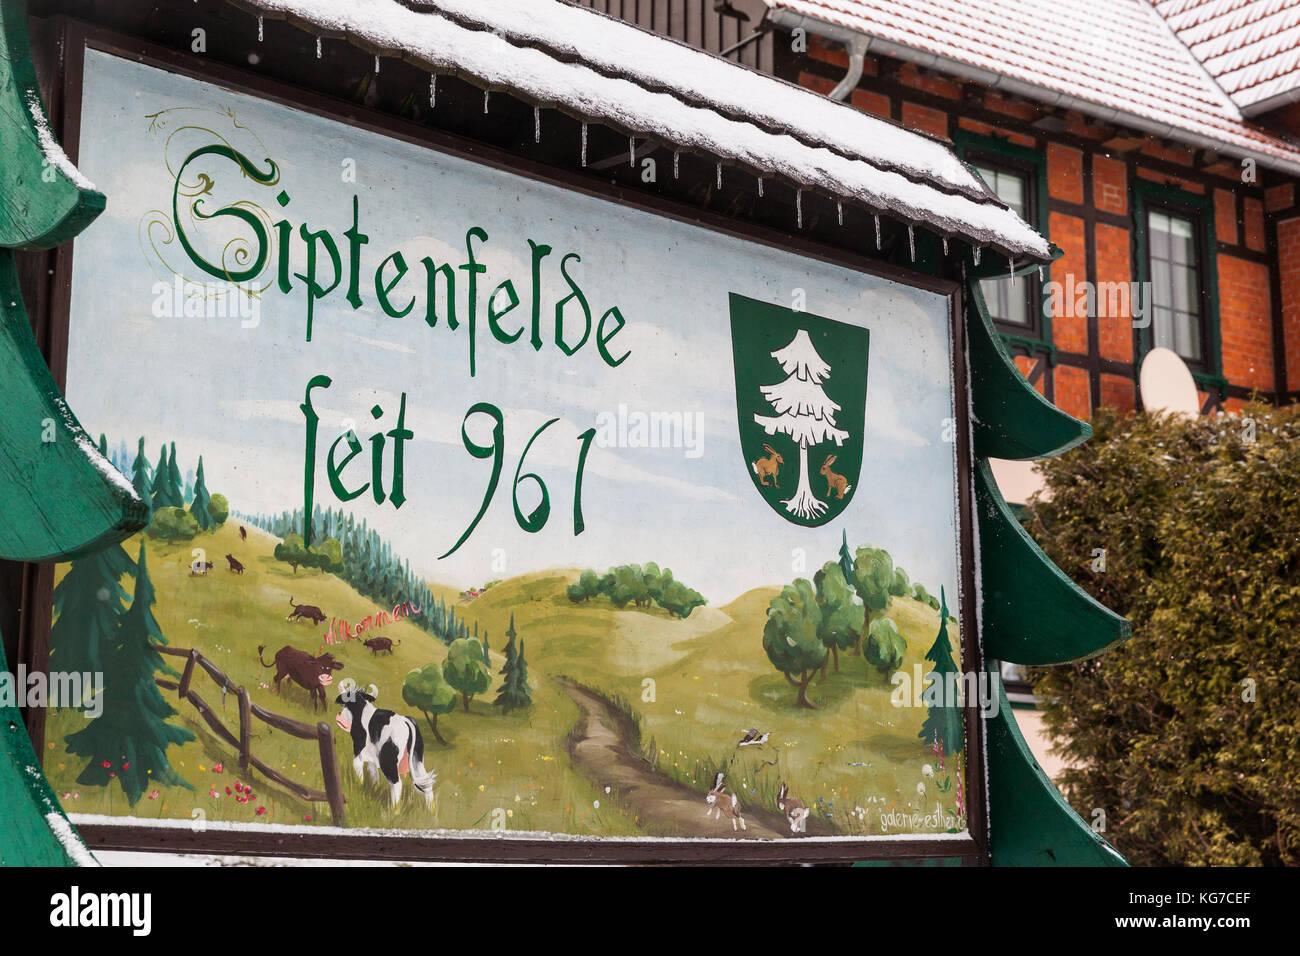 Tafel Siptenfelde seit 961 - Stock Image